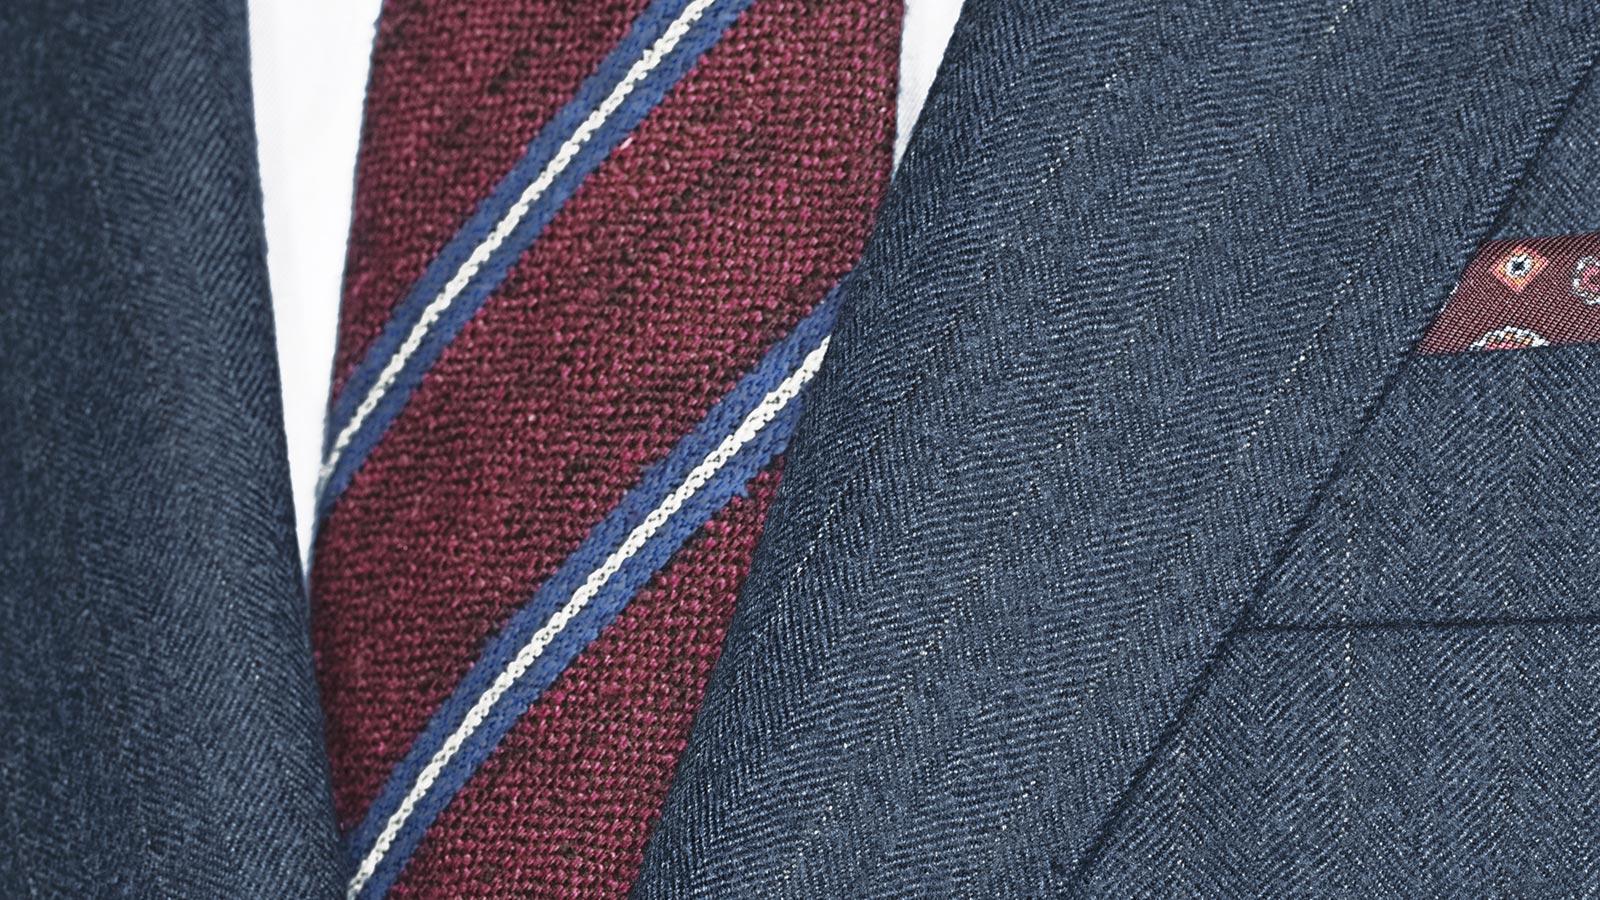 Ecru Pinstripe Blue Suit - slider image 1